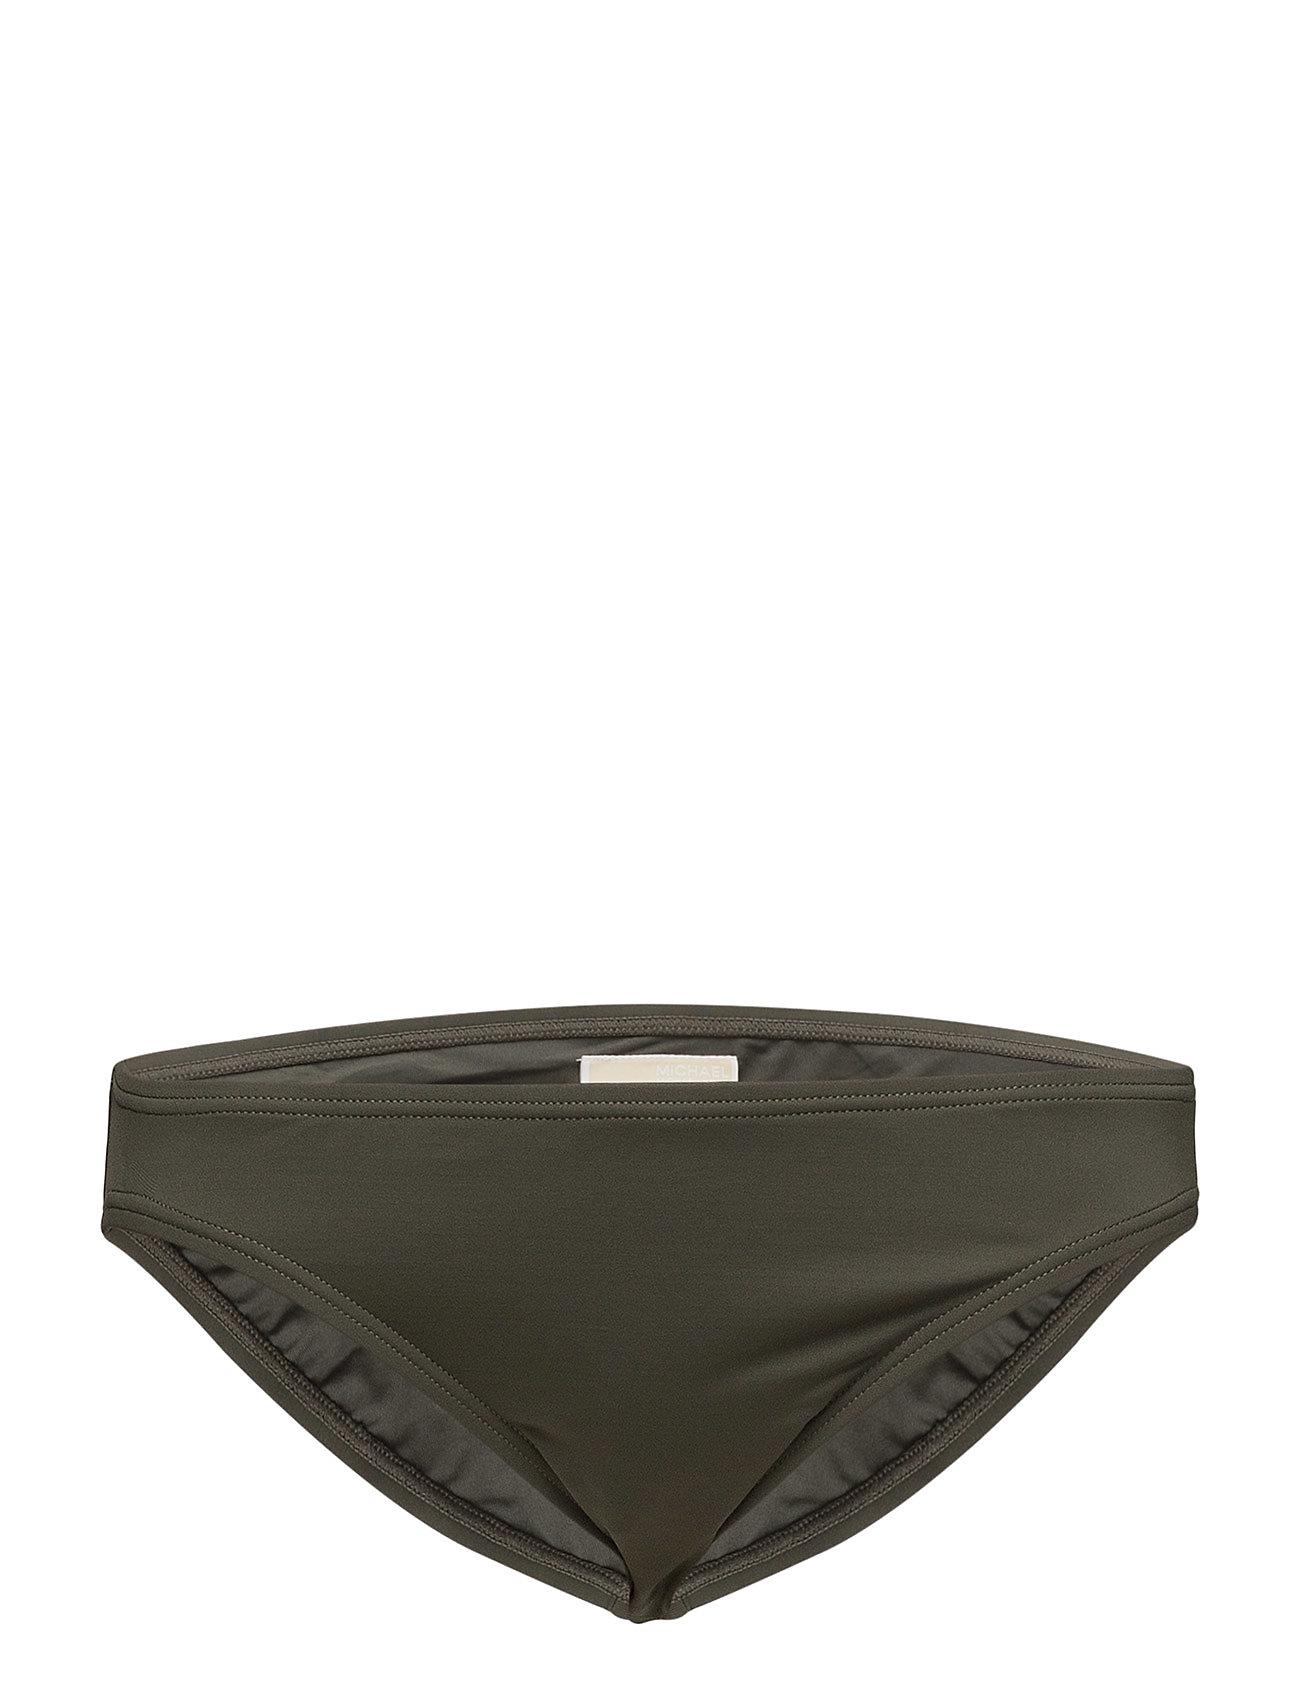 Michael Kors Swimwear CLSC BTM - IVY